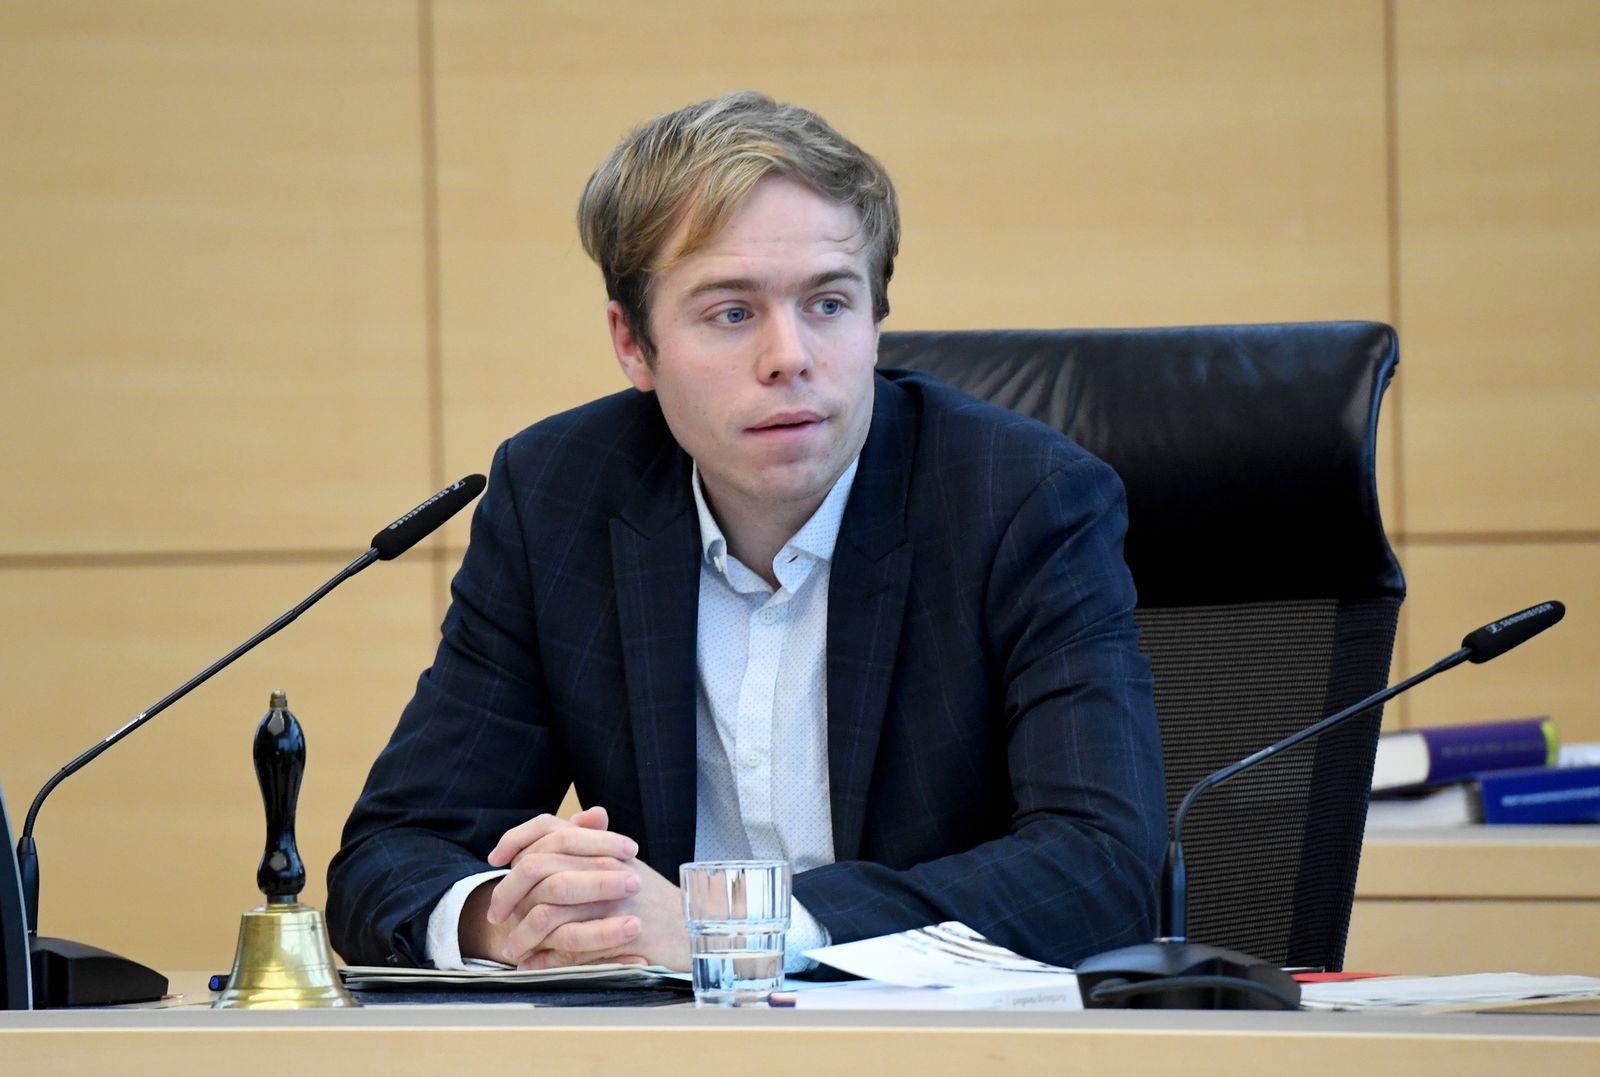 Landtagsvizepräsident Rasmus Andresen